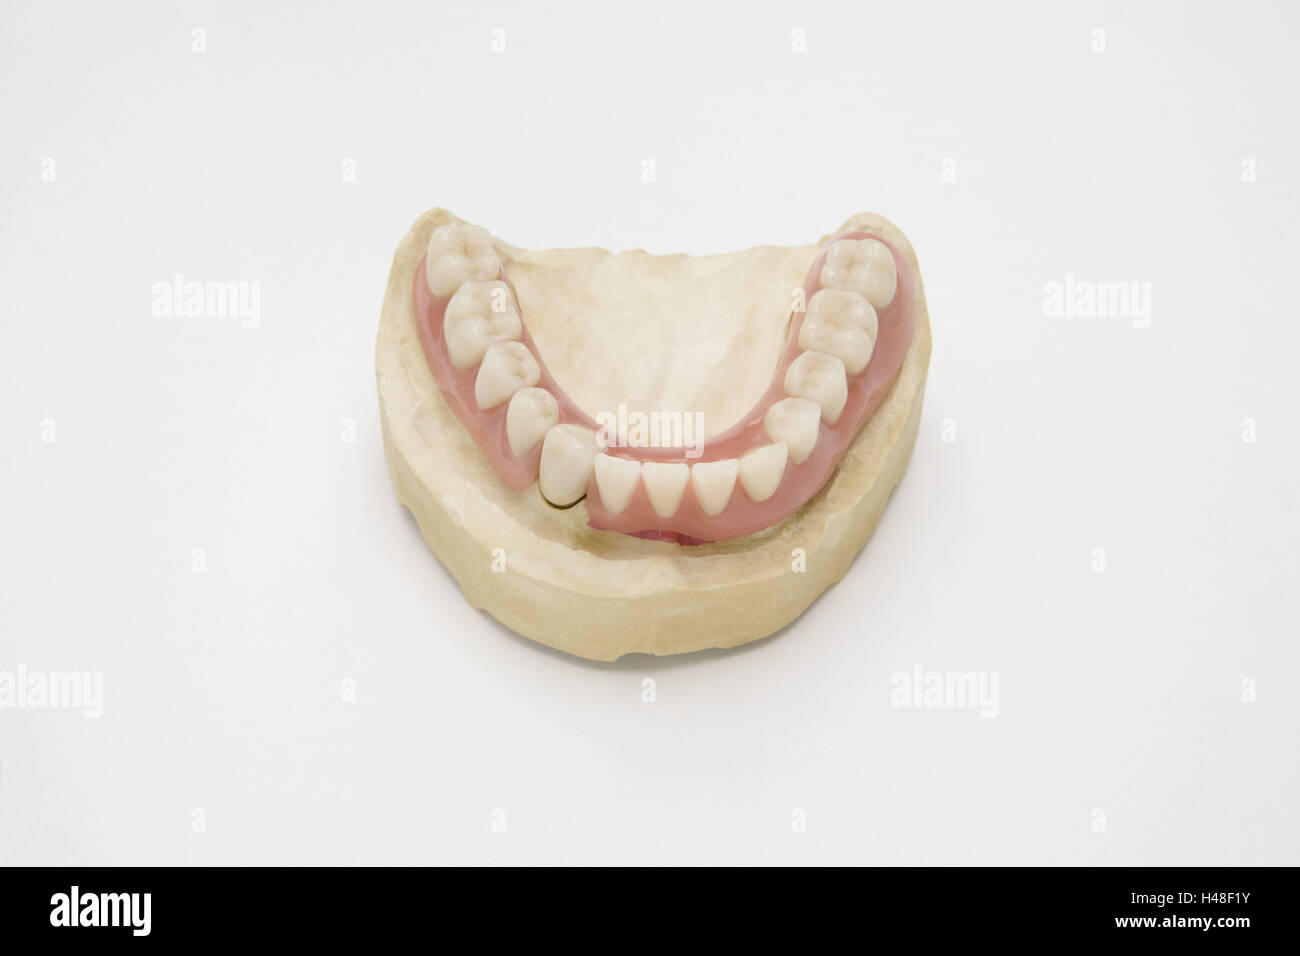 Denture, lower jaw, gypsum model, set dentures, cog laboratory, prosthesis, bite, cogs, cog precaution, dentistry, - Stock Image